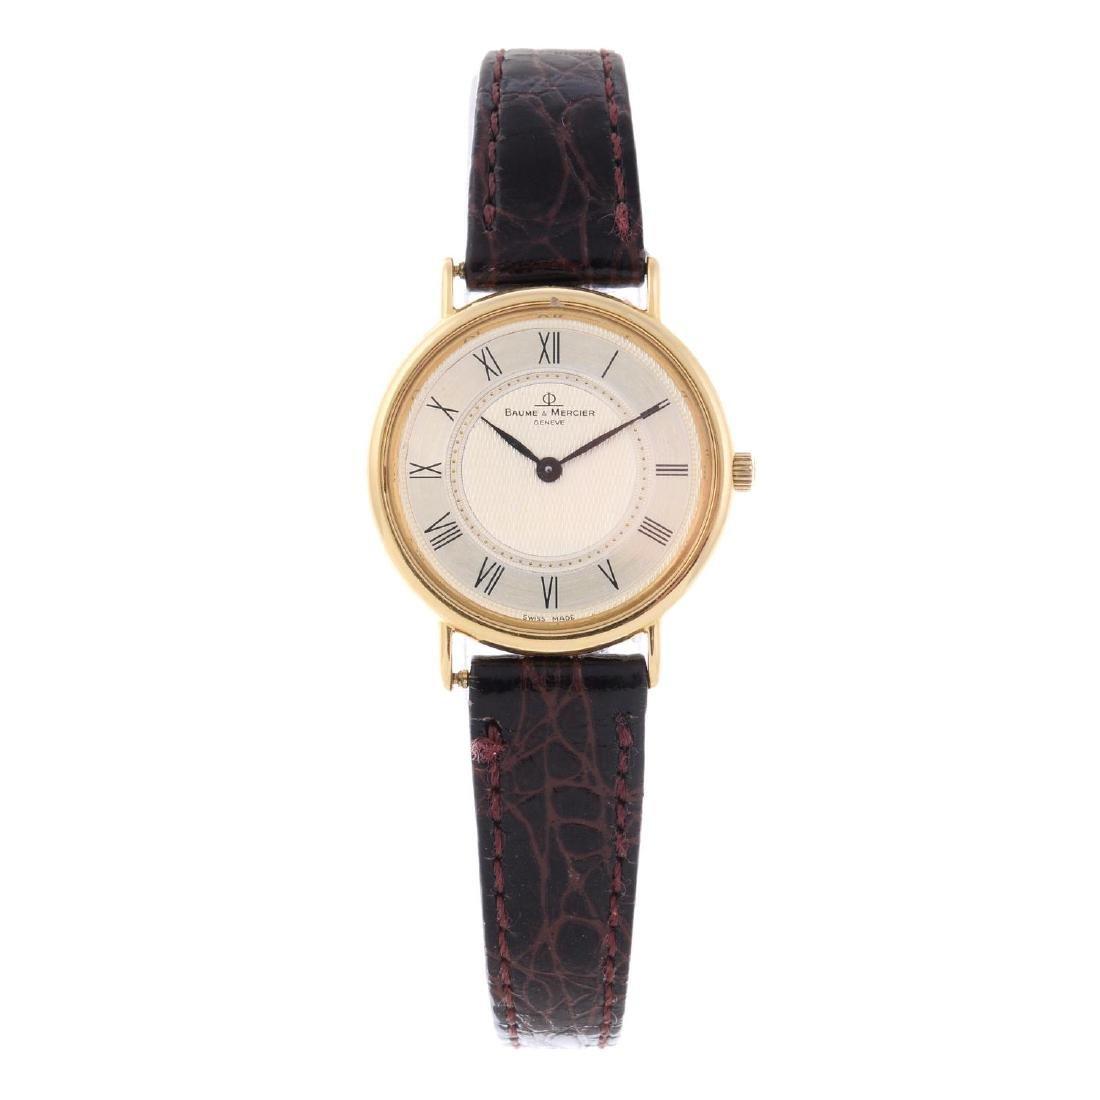 BAUME & MERCIER - a lady's wrist watch. 18ct yellow